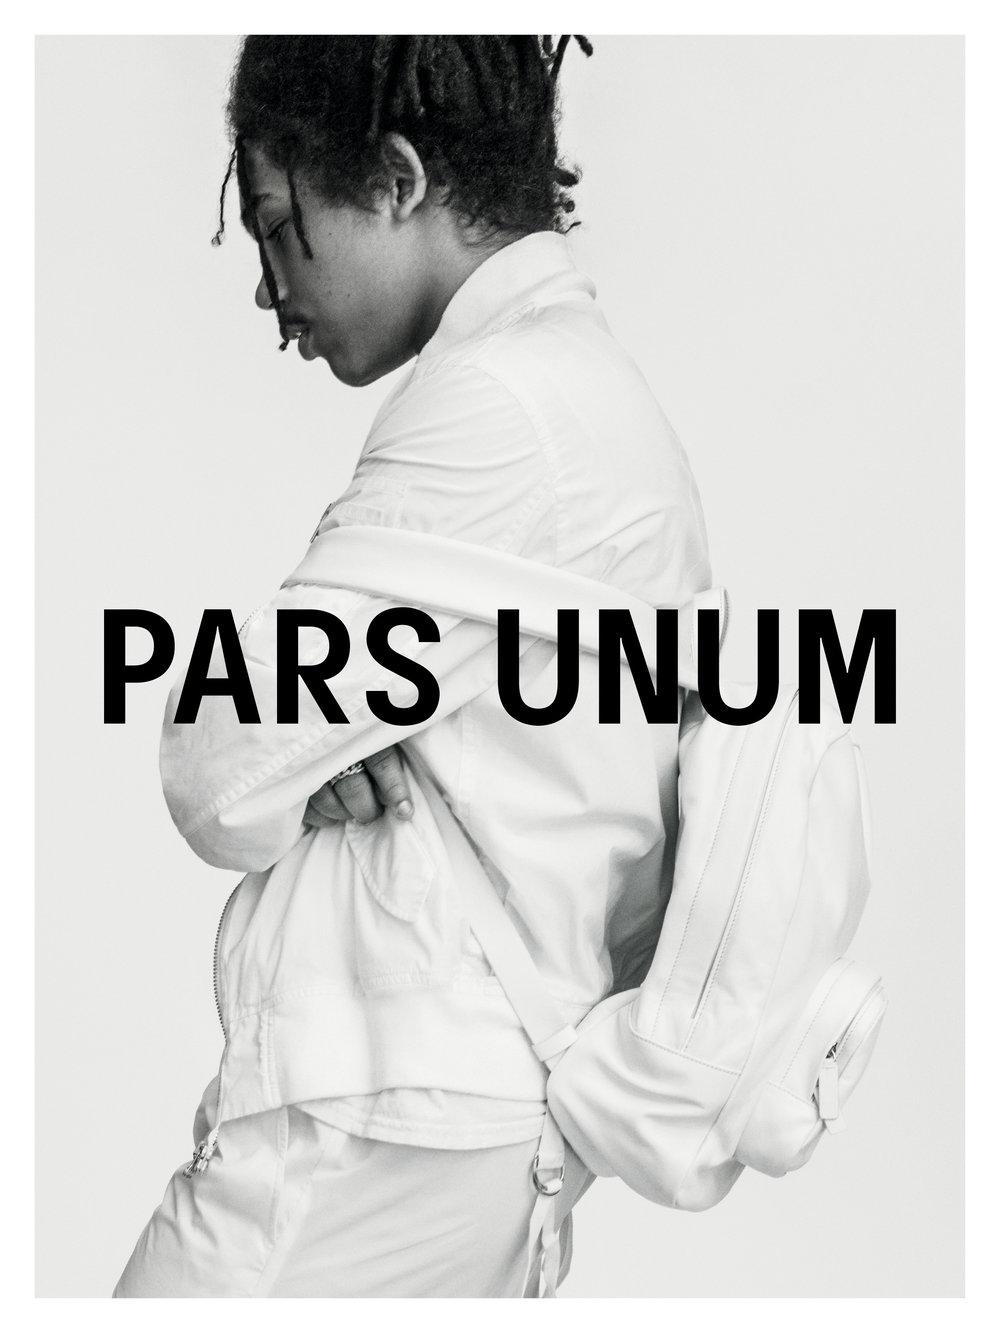 PARS_UNUM_Lookbook.jpg